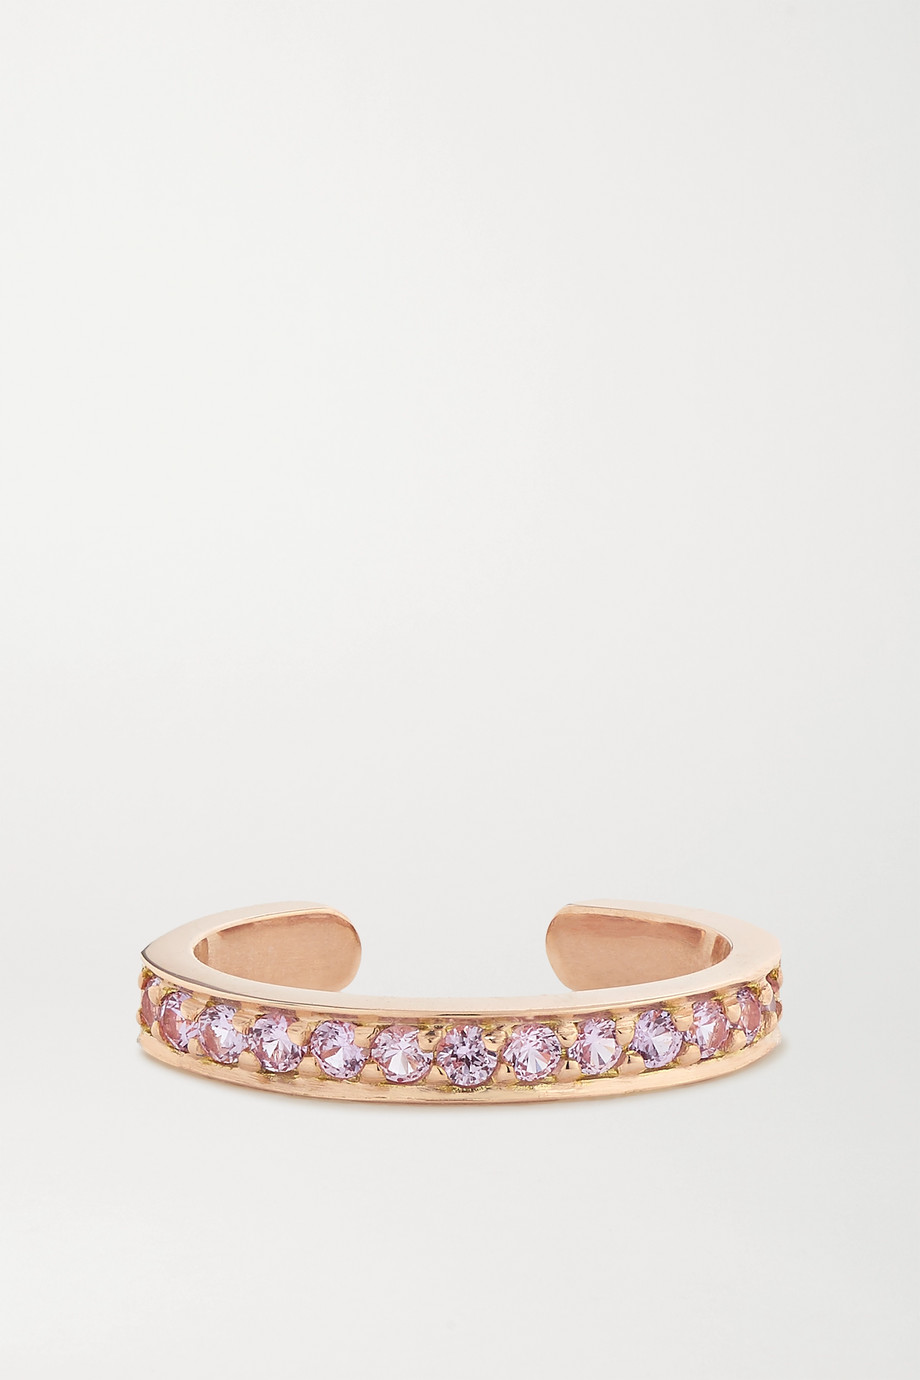 Anita Ko 18-karat rose gold sapphire ear cuff